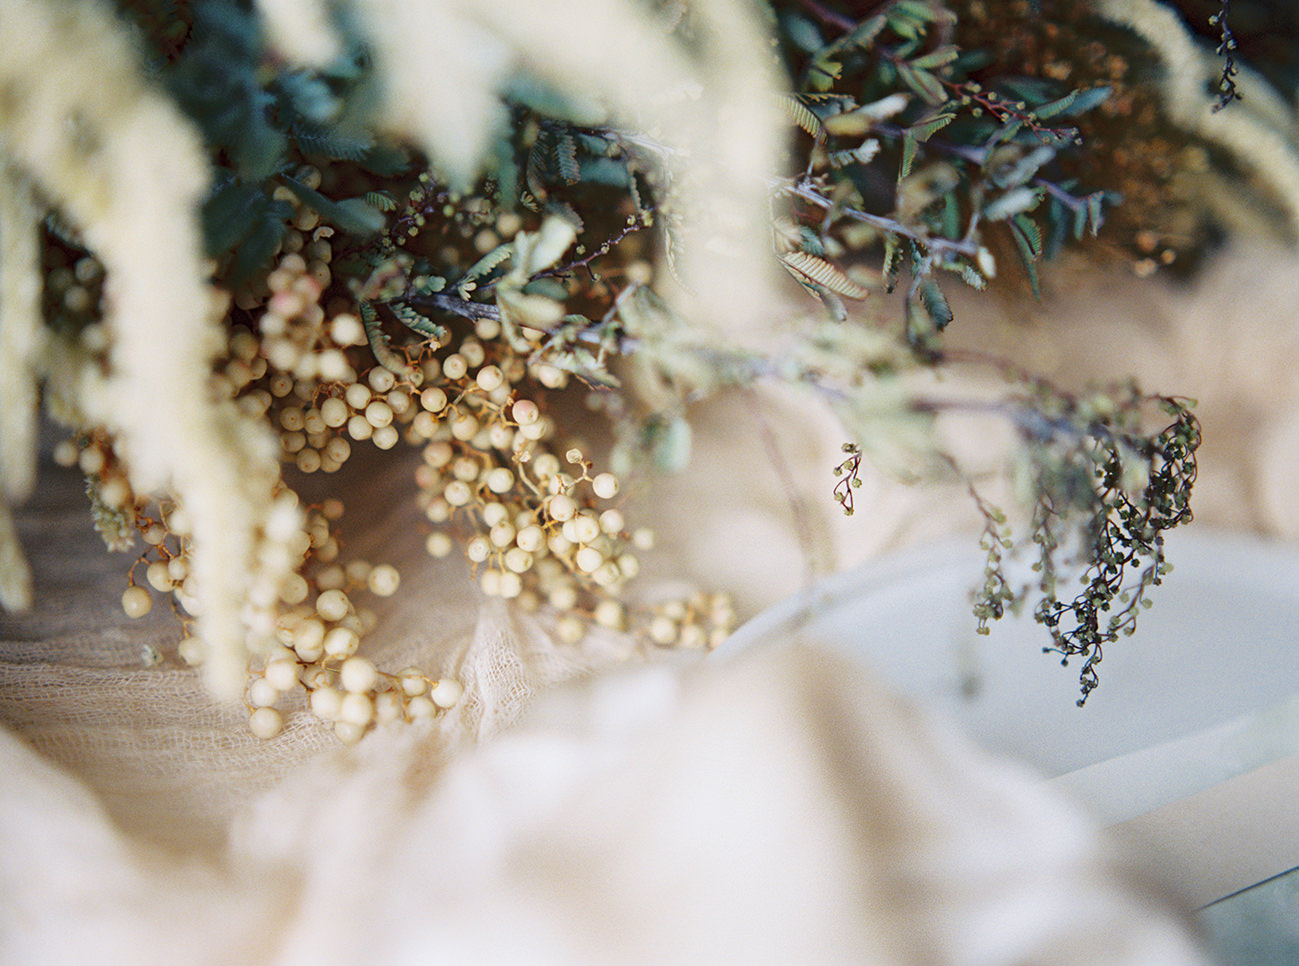 Bridal Inspiration, Wedding Bouquet, Hääkuvaus, Film Wedding Photographer, Table Setting Inspiration, Stationery, Dried Flowers, www.nordandmae.com, www.susannanordvall (32).jpg